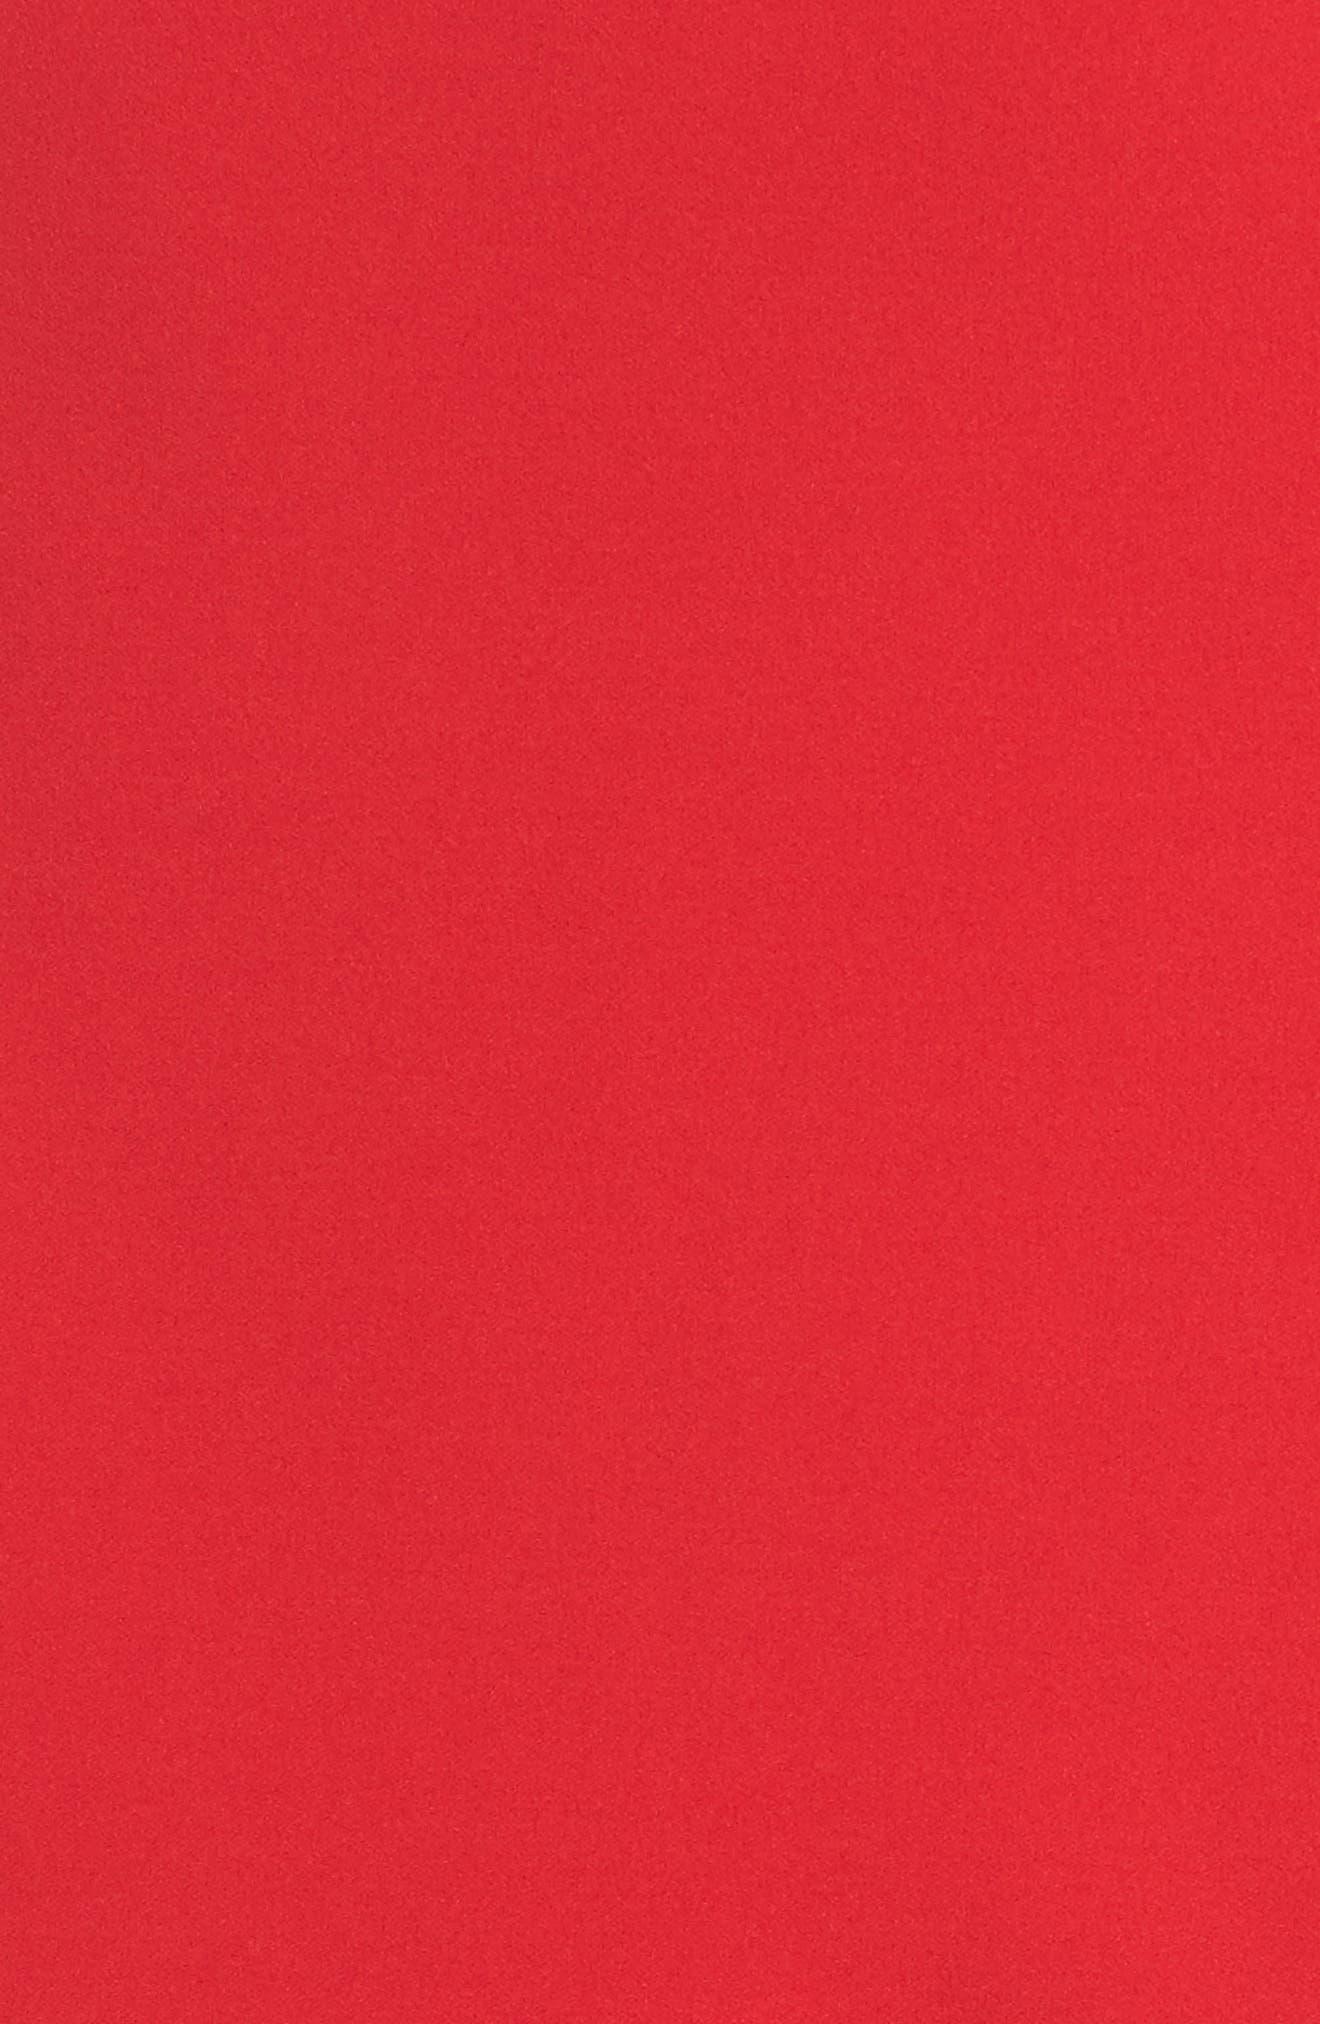 One-Shoulder Ruffle Dress,                             Alternate thumbnail 10, color,